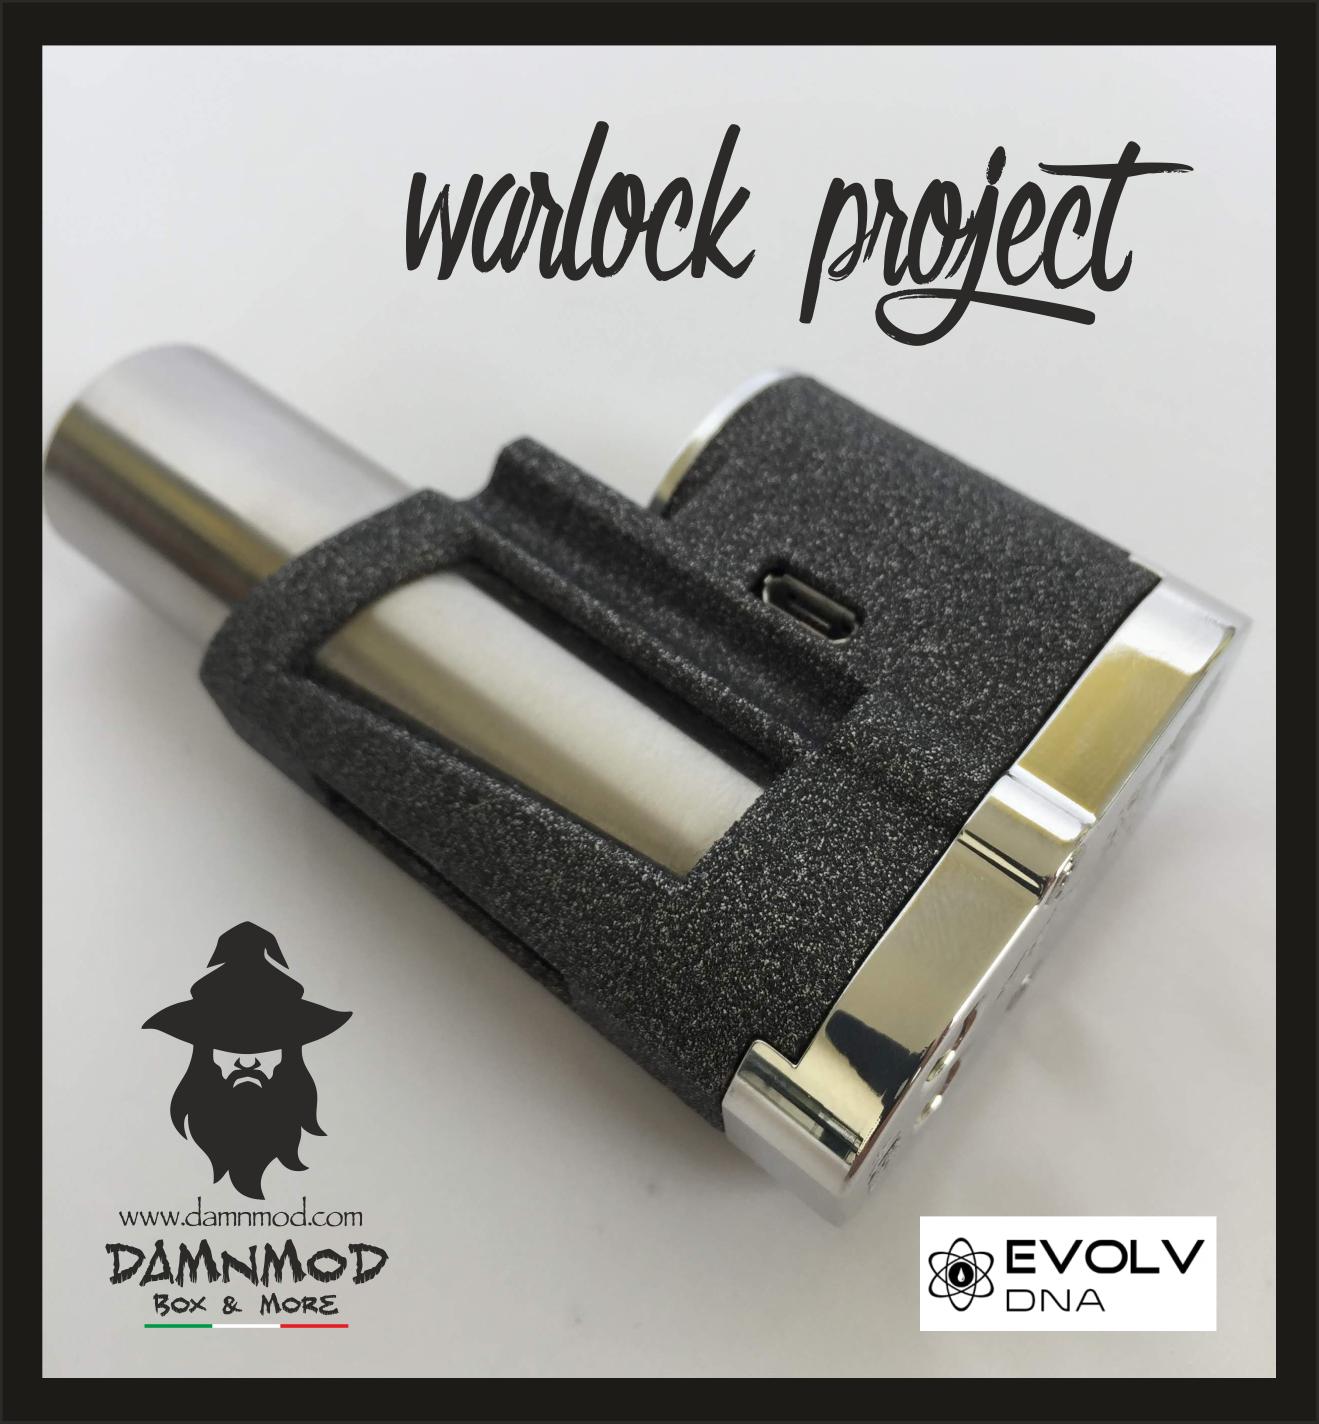 "WARLOCK PROJECT ""ELITE EDITION"" EVOLV DNA60 - ALUMIDE"